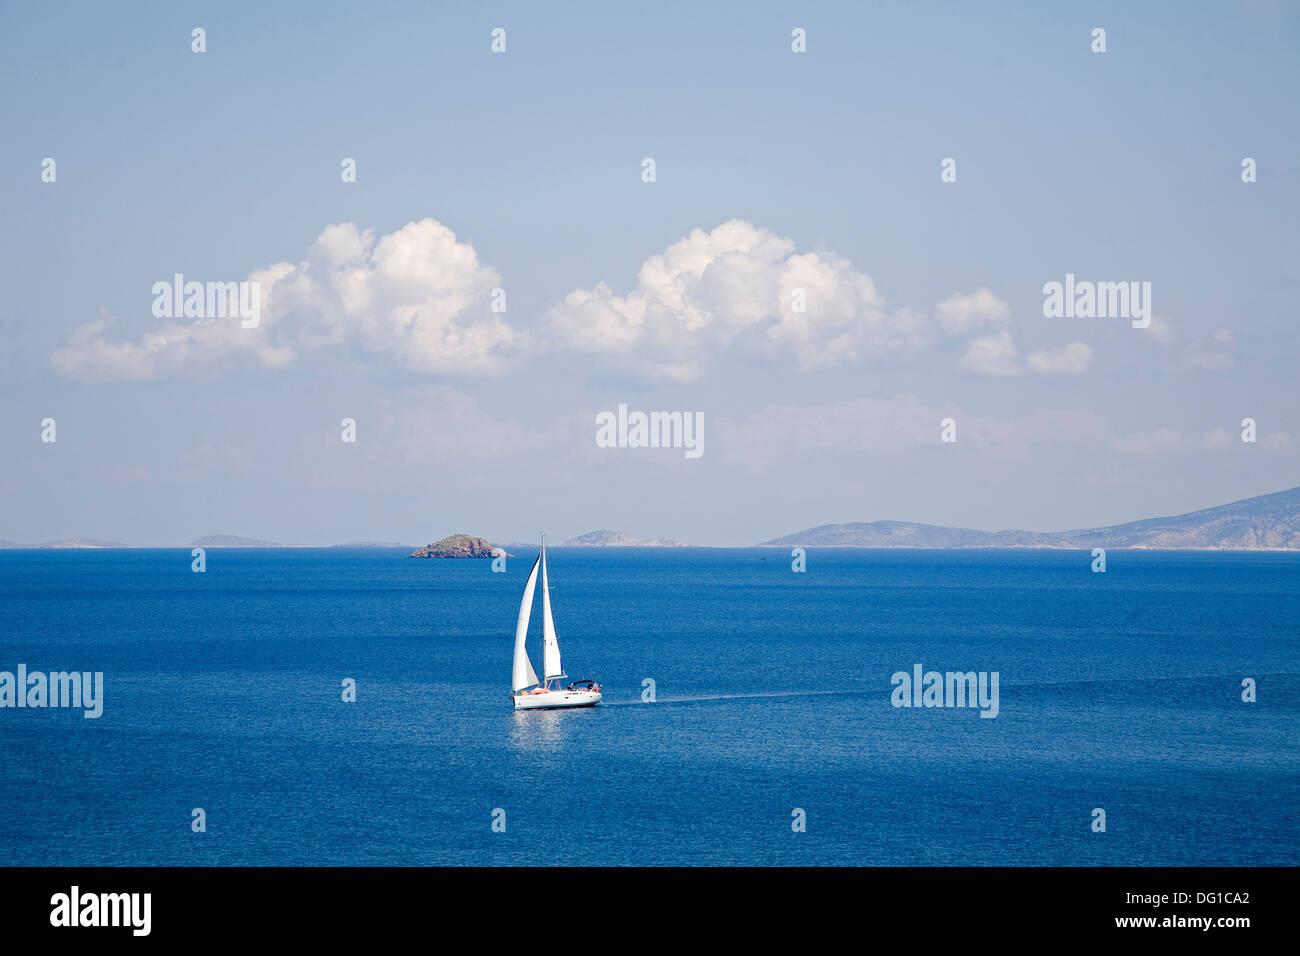 europe, greece, dodecanese, patmos island, sailing boat - Stock Image